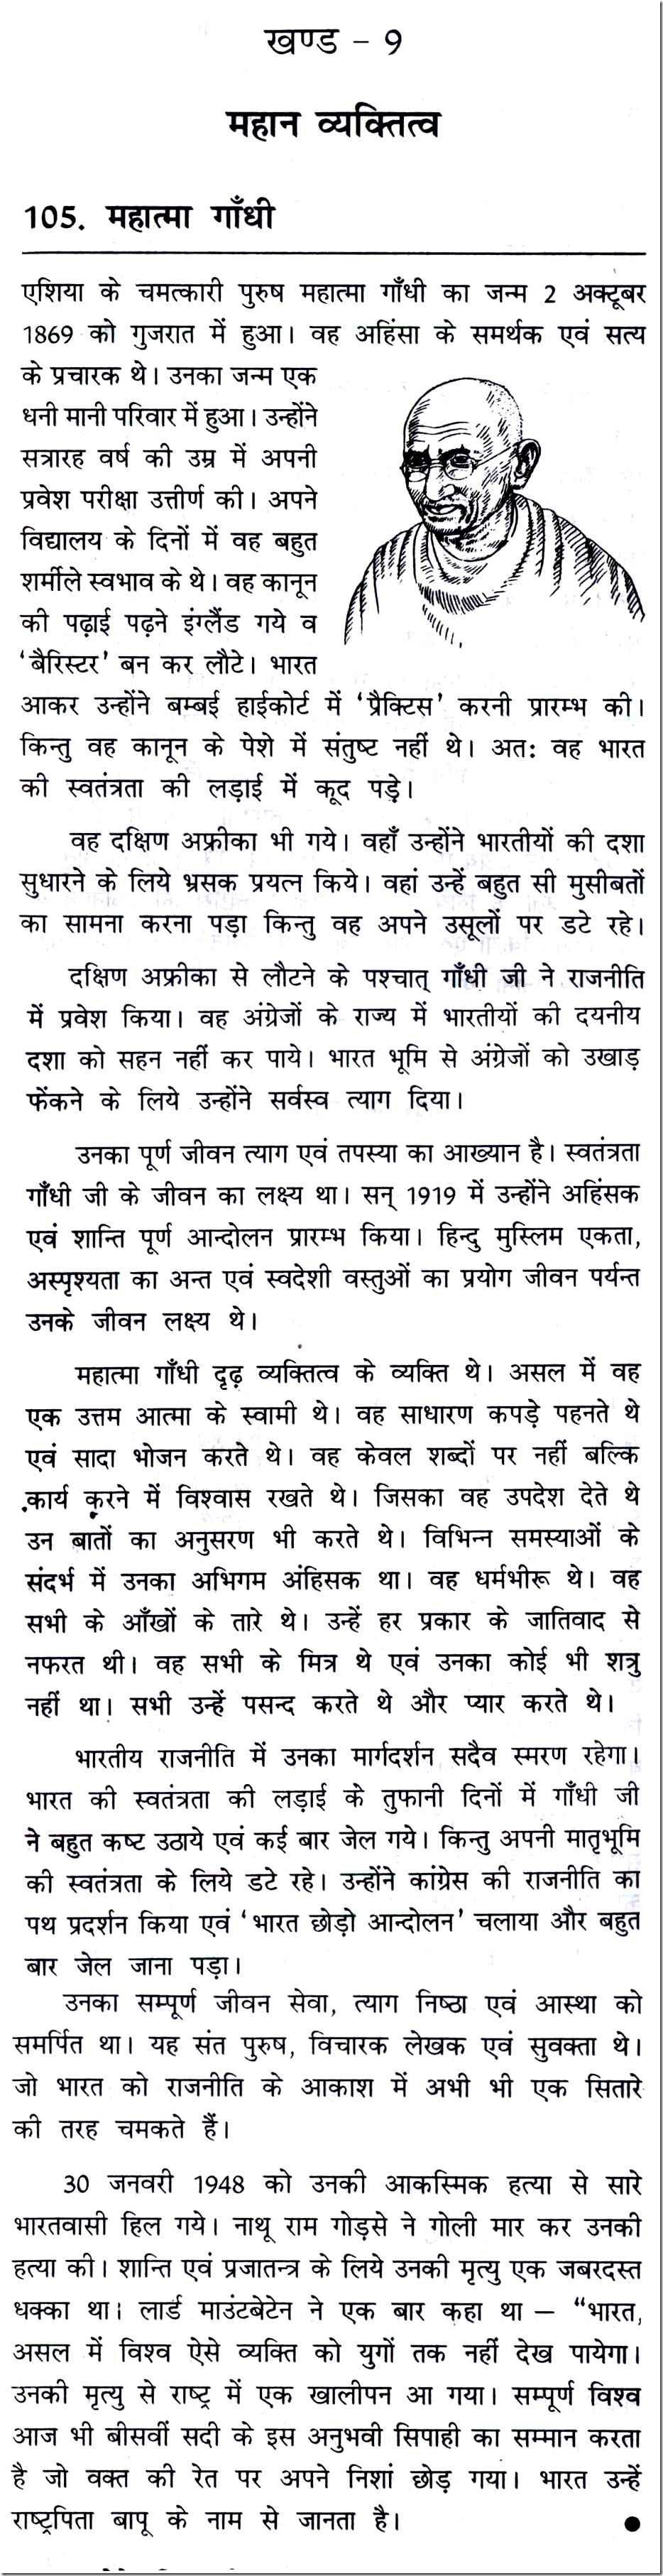 004 Gandhiji Essay 10107 Thumb Sensational Mahatma Gandhi In Gujarati Pdf Free Download Hindi Language Ma Nibandh Full